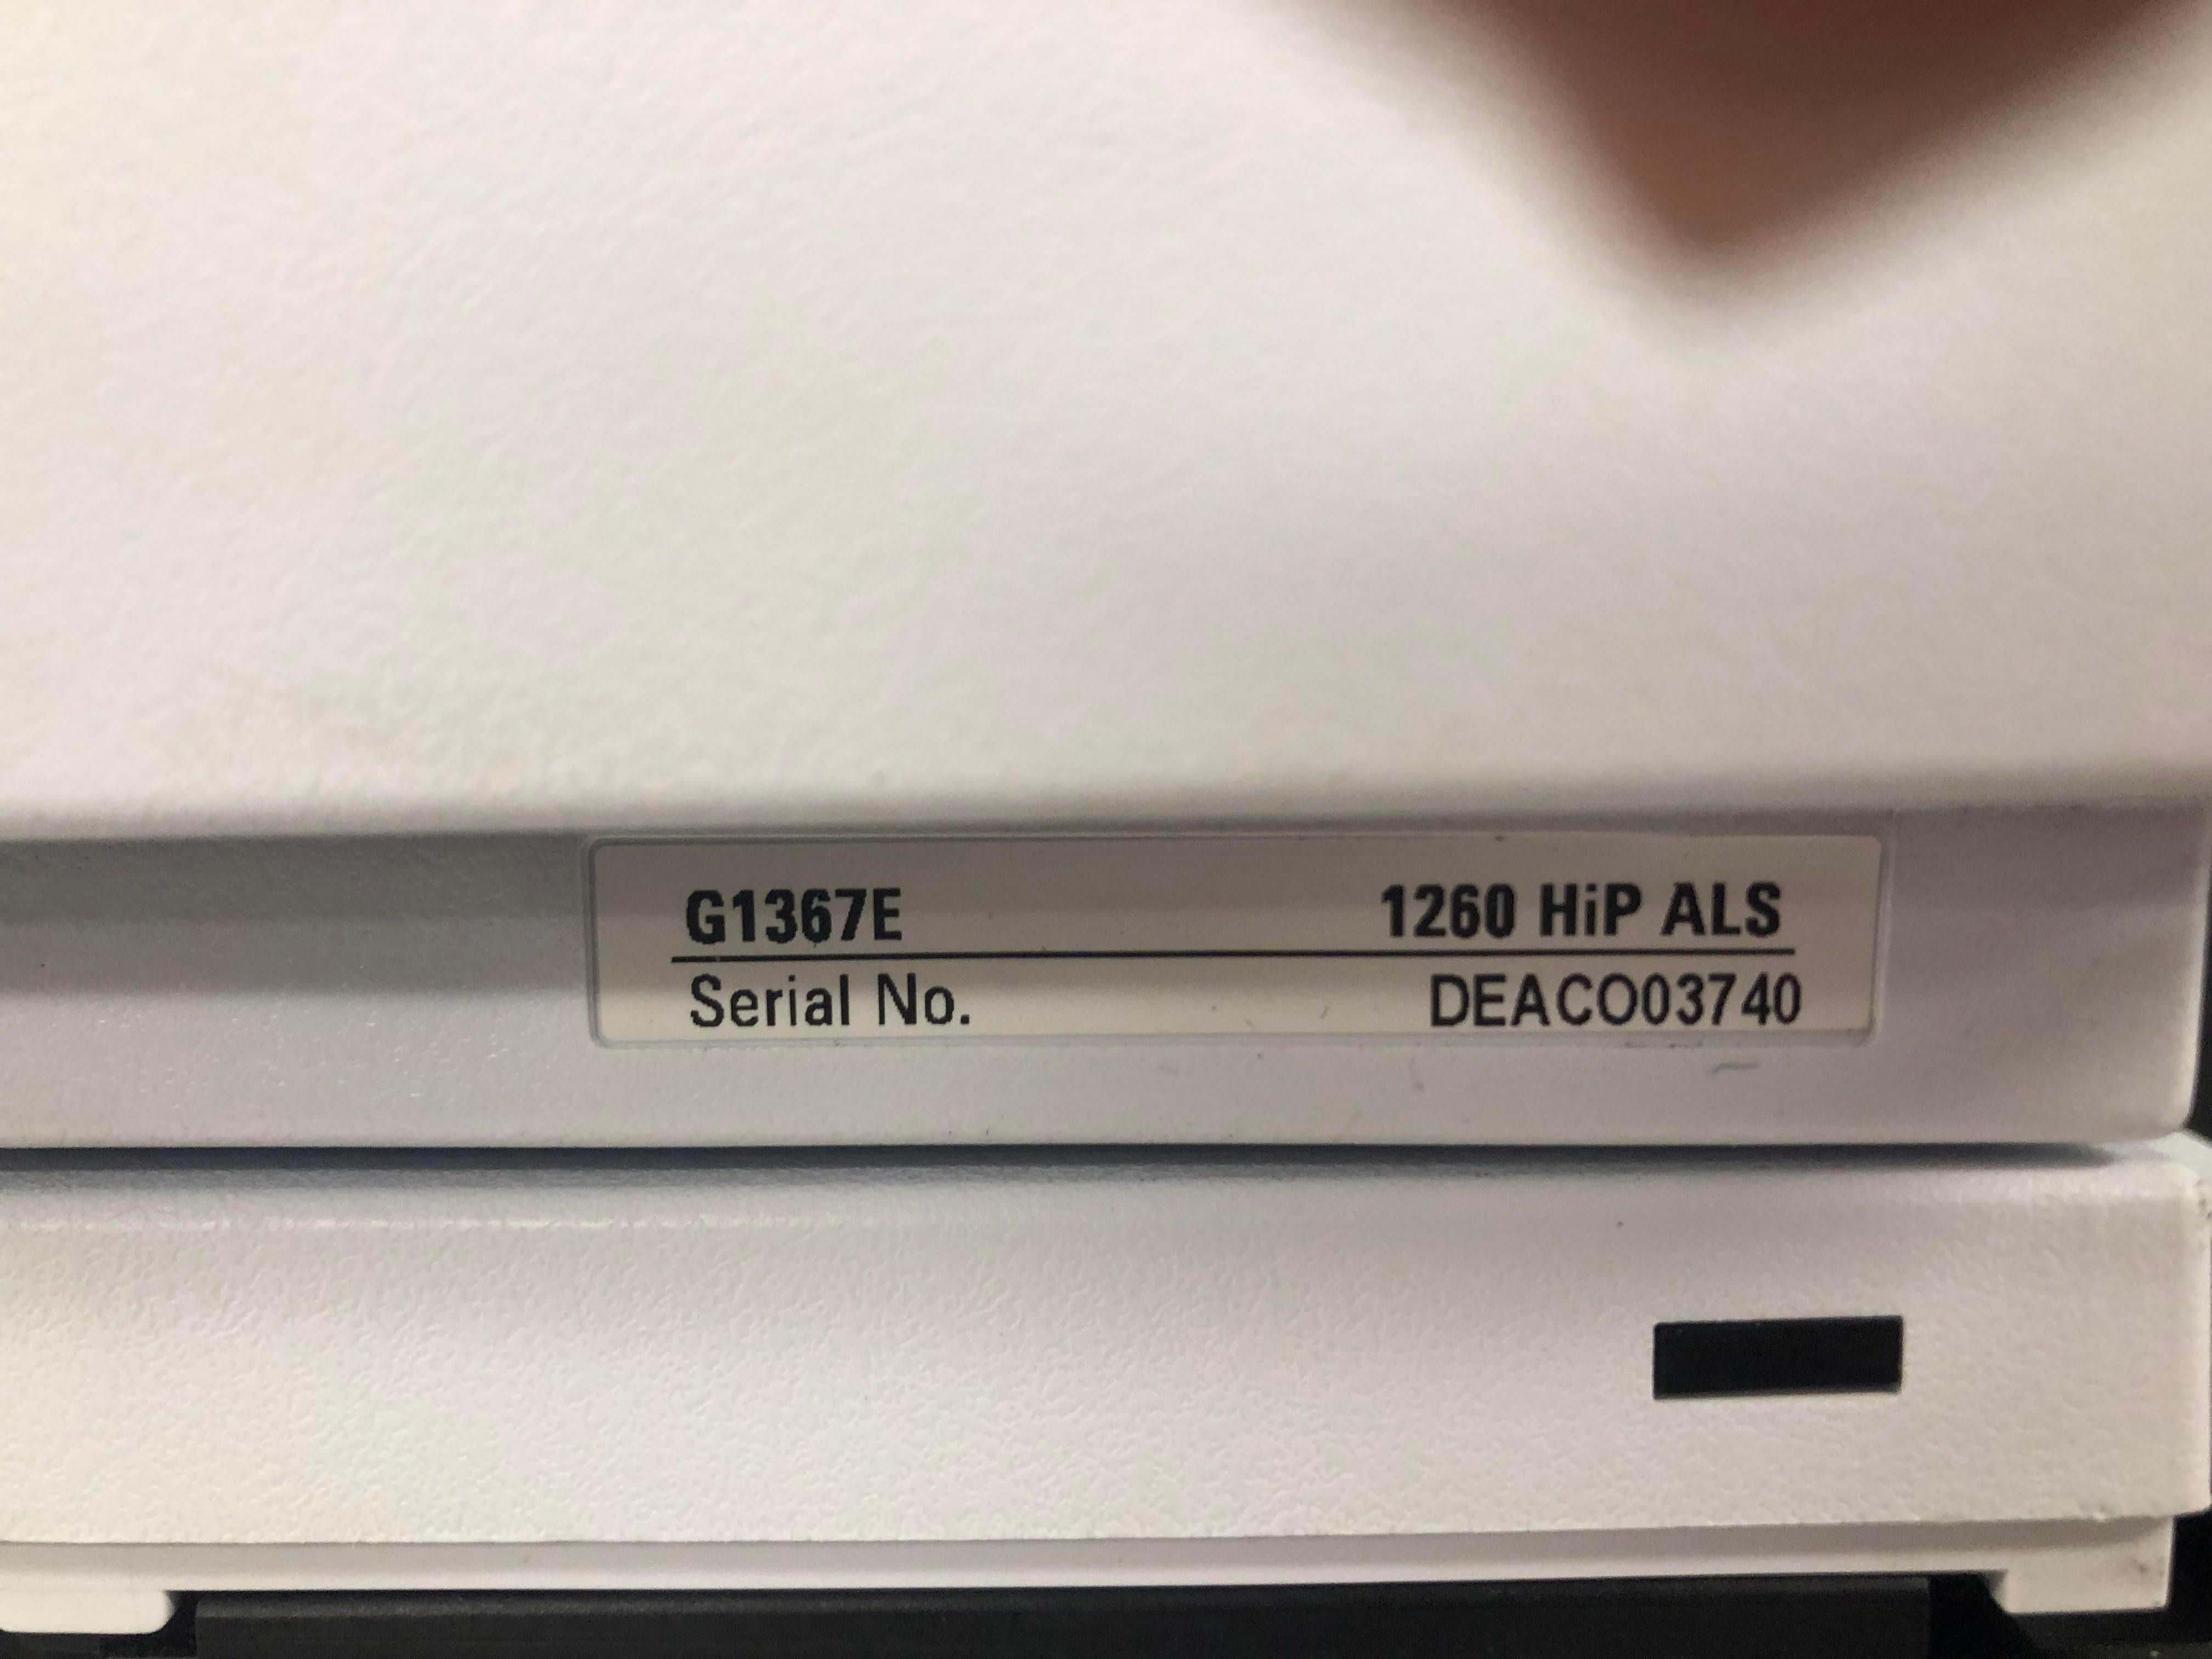 Agilent 1260 HPLC G1367E 1260 Hip ALS, G1311B QuatPump, G1315D DAD, G1316A TCC with Tray, 4 Bottles,